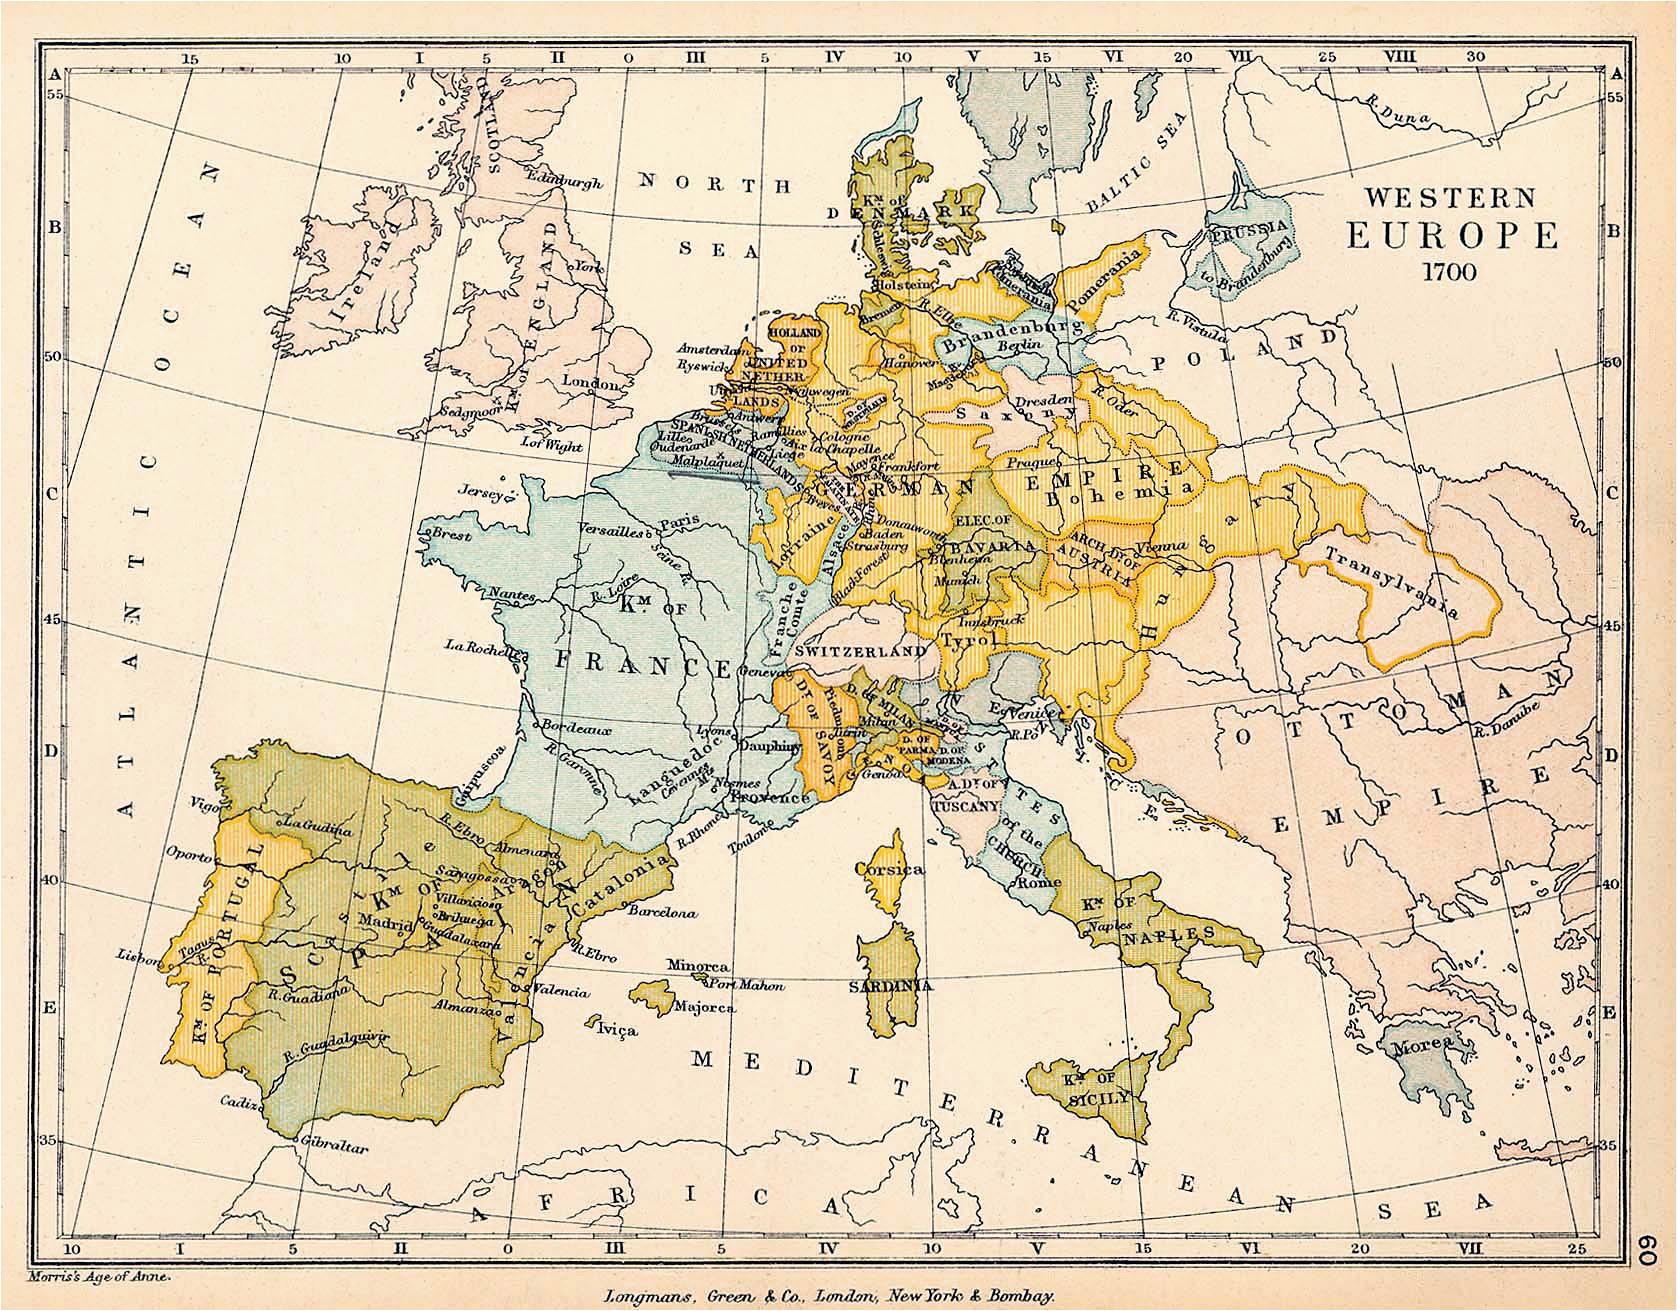 17th Century Europe Map atlas Of European History Wikimedia Commons